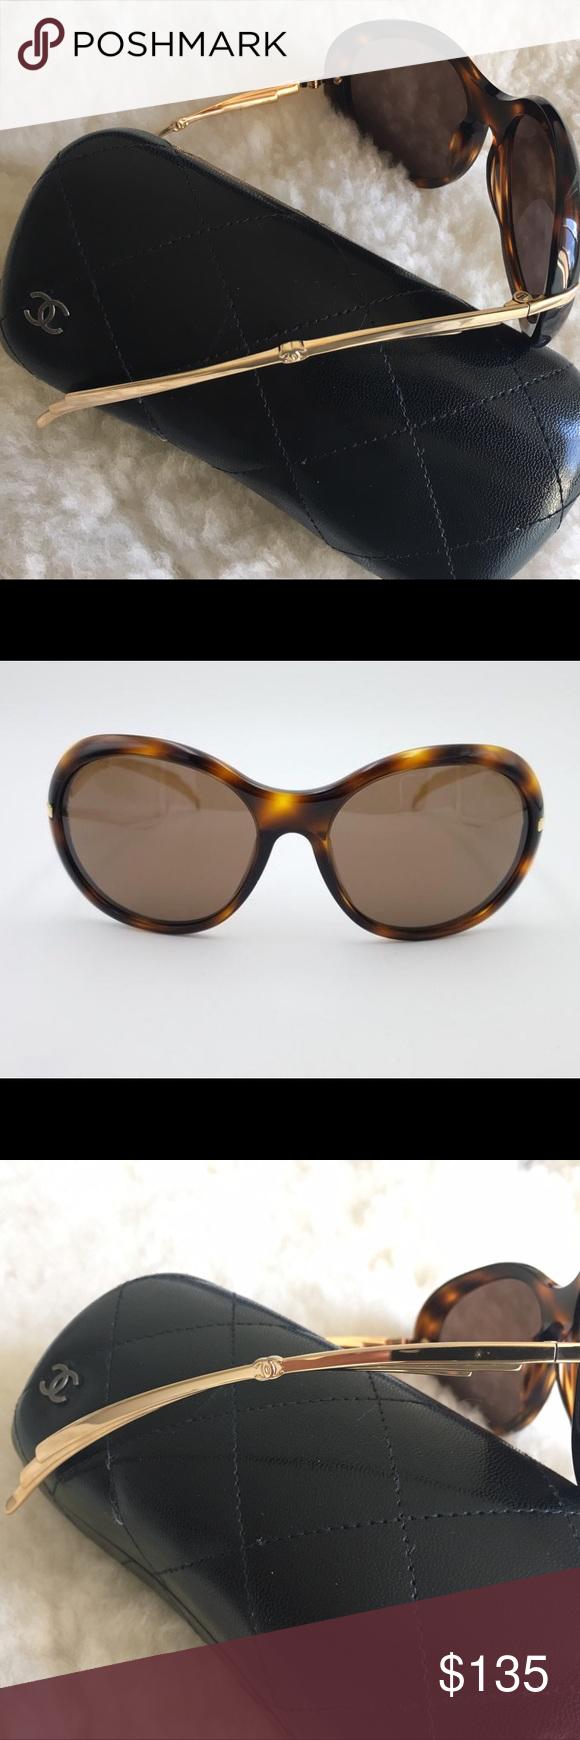 Chanel 5152 Sunglasses w/ Gold Angel Wings   My Posh Picks   Pinterest